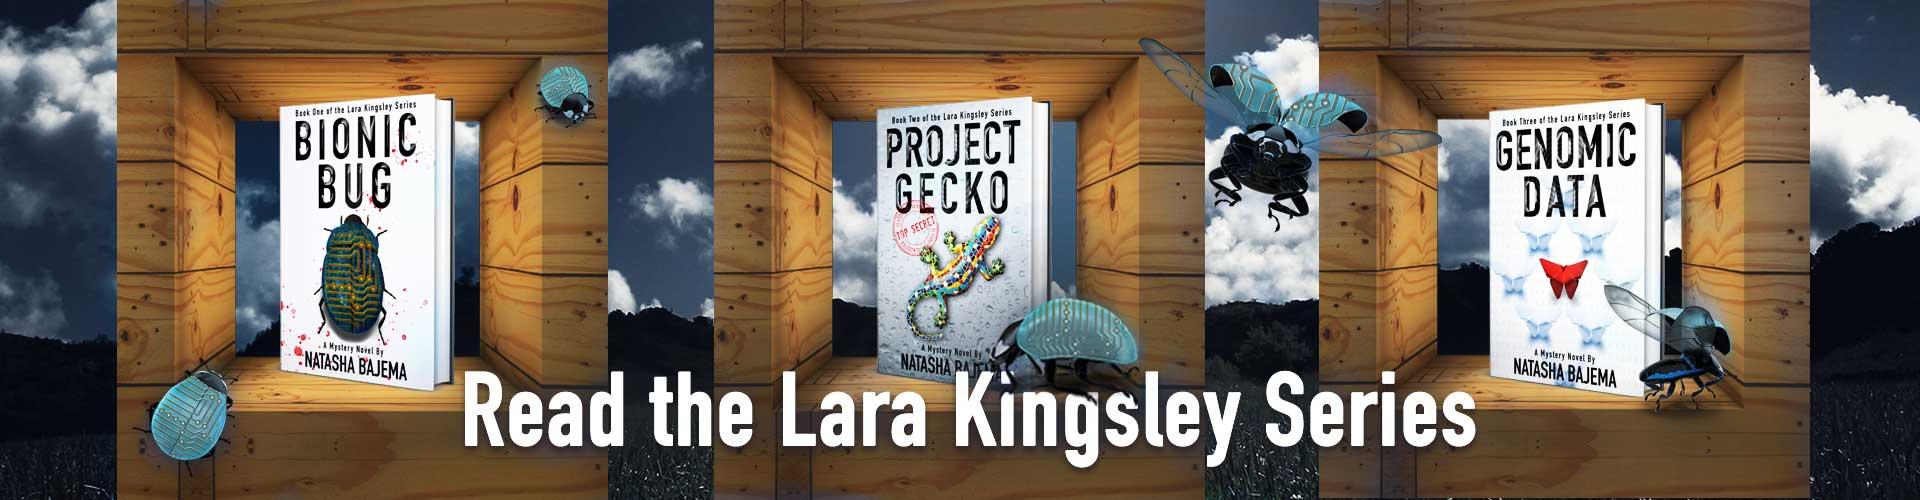 Read the Lara Kingsley Series